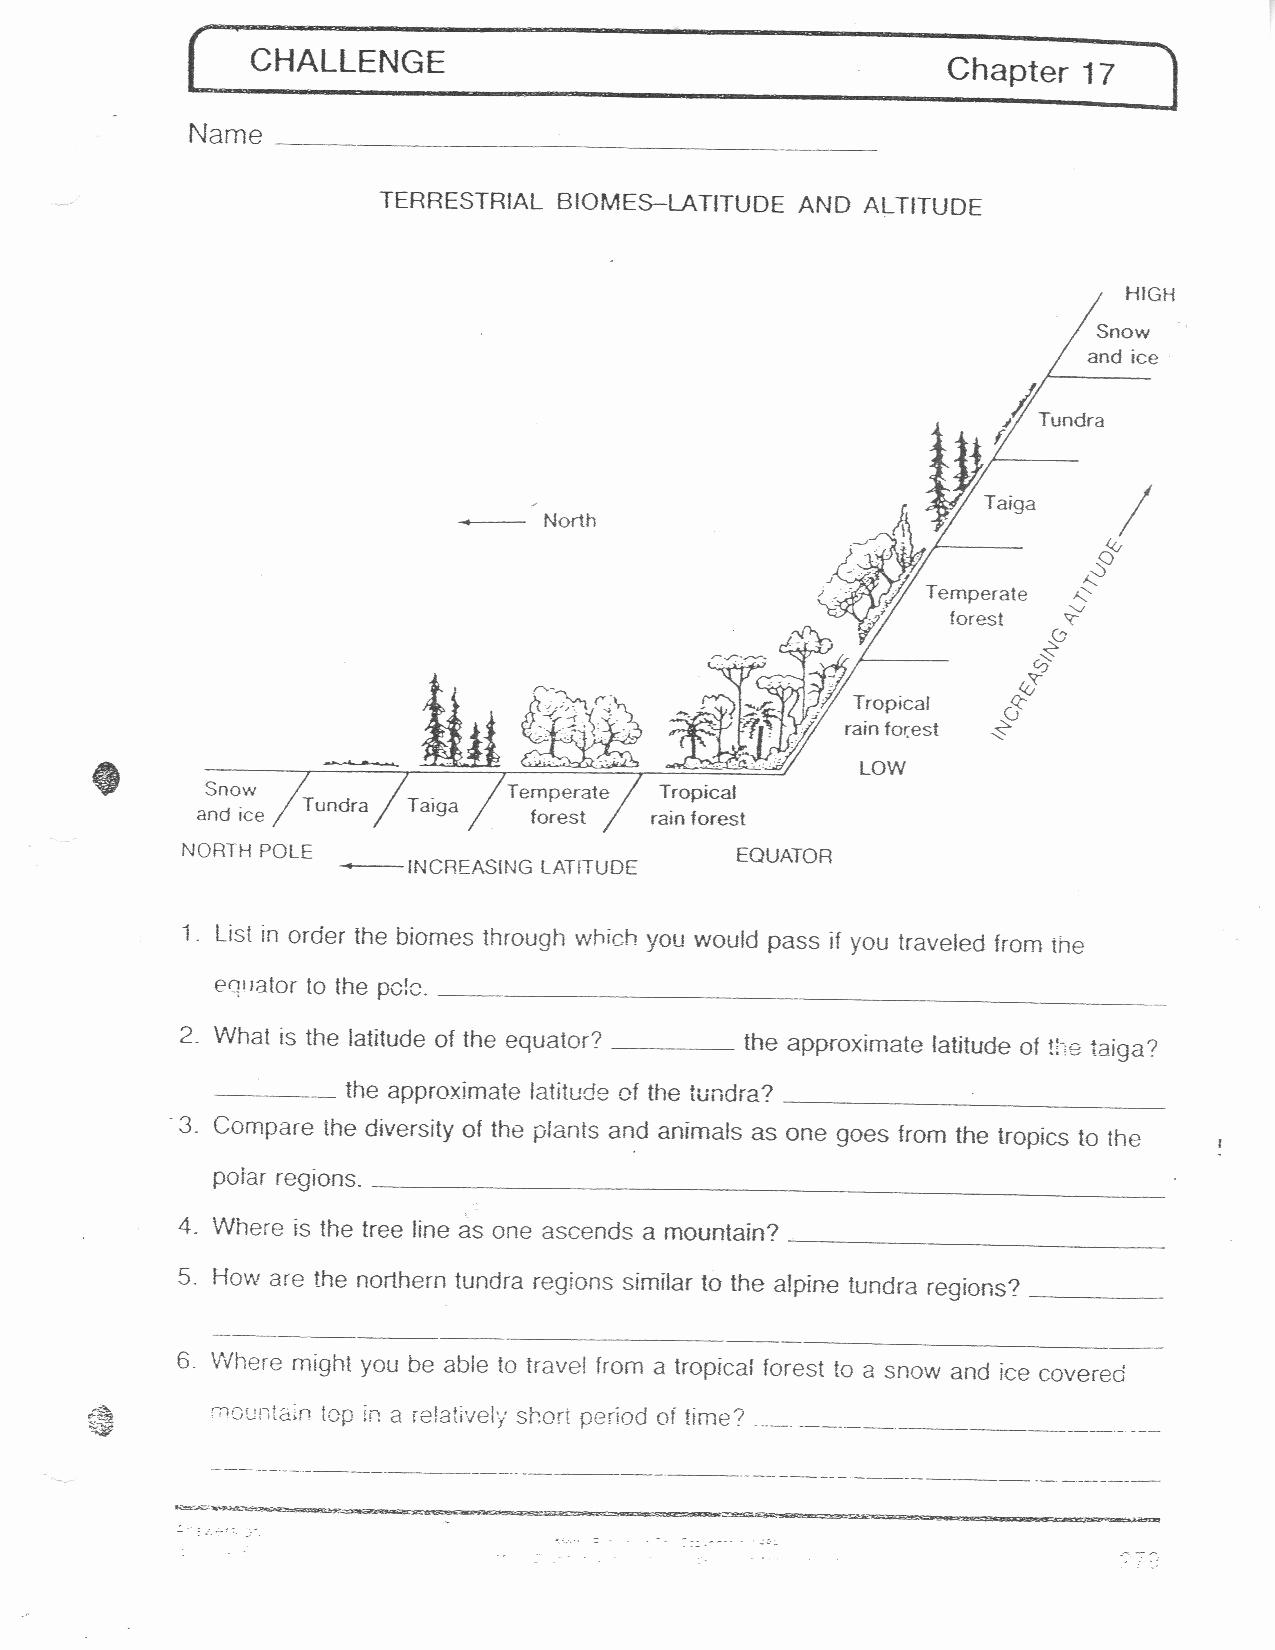 Ecology Worksheets Middle School Unique Ecology Worksheets Middle School